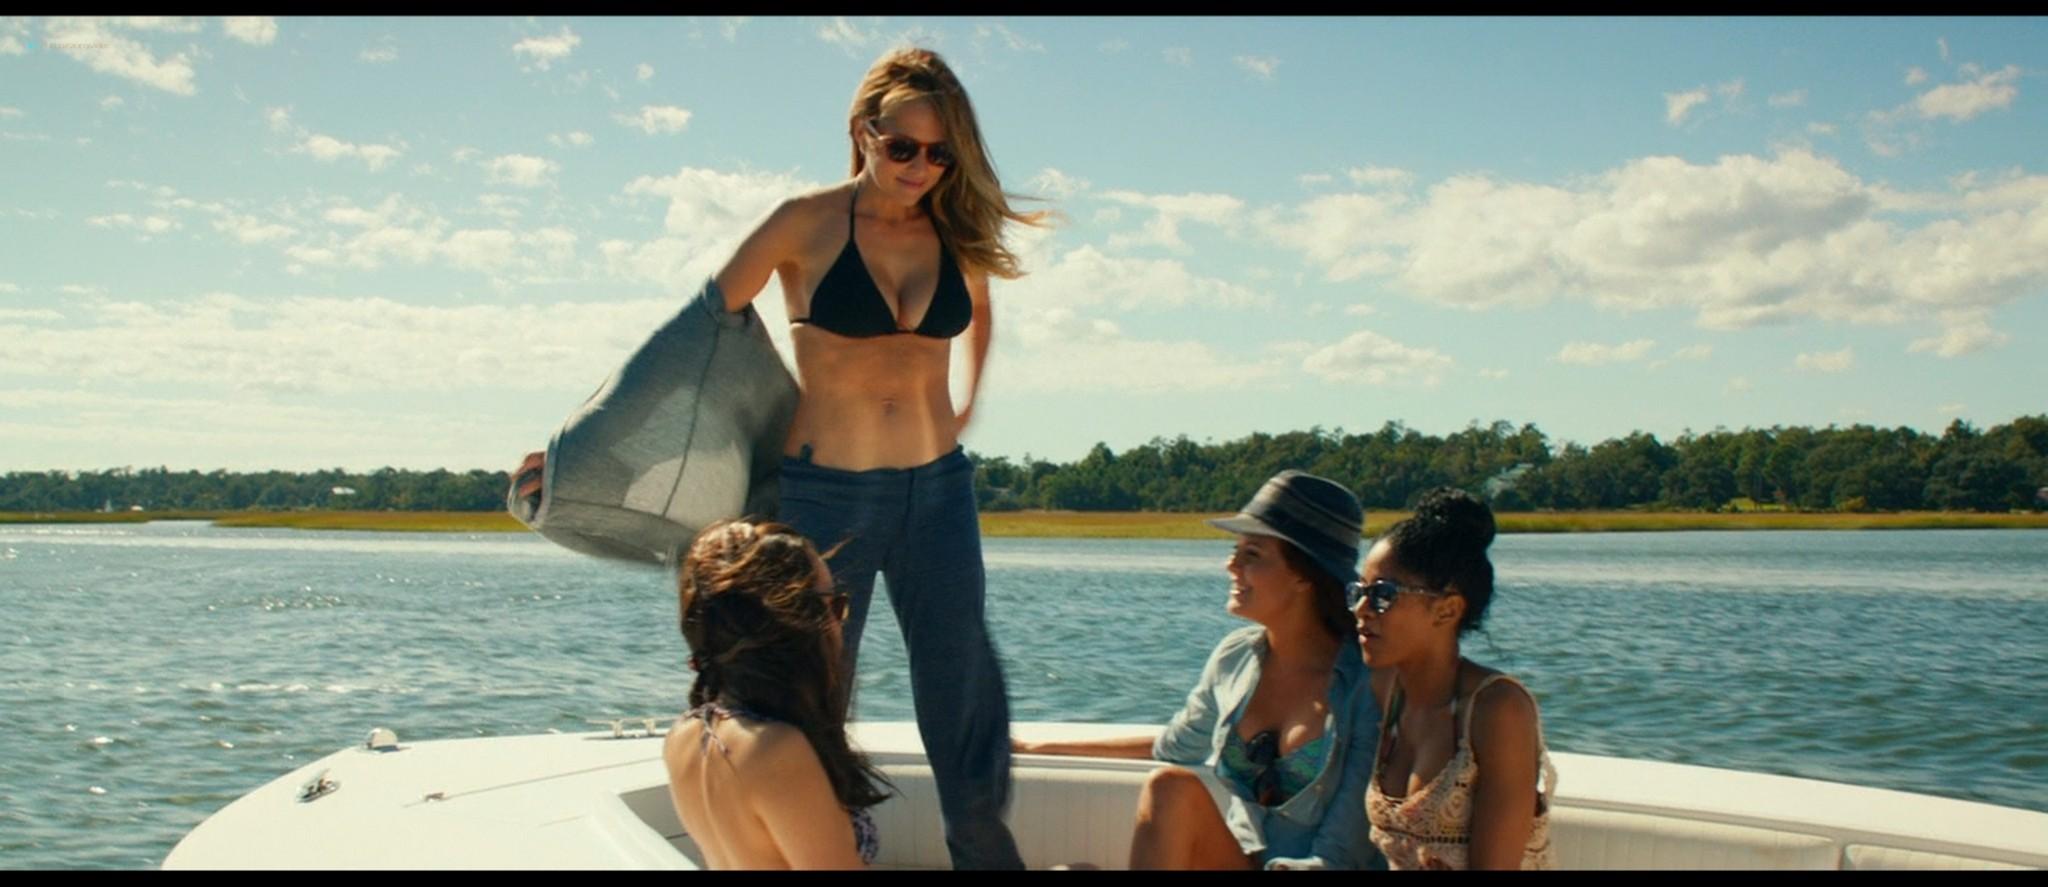 Teresa Palmer hot bikini and Maggie Grace, Alexandra Daddario hot too - The Choice (2016) HD 1080p BluRay (13)